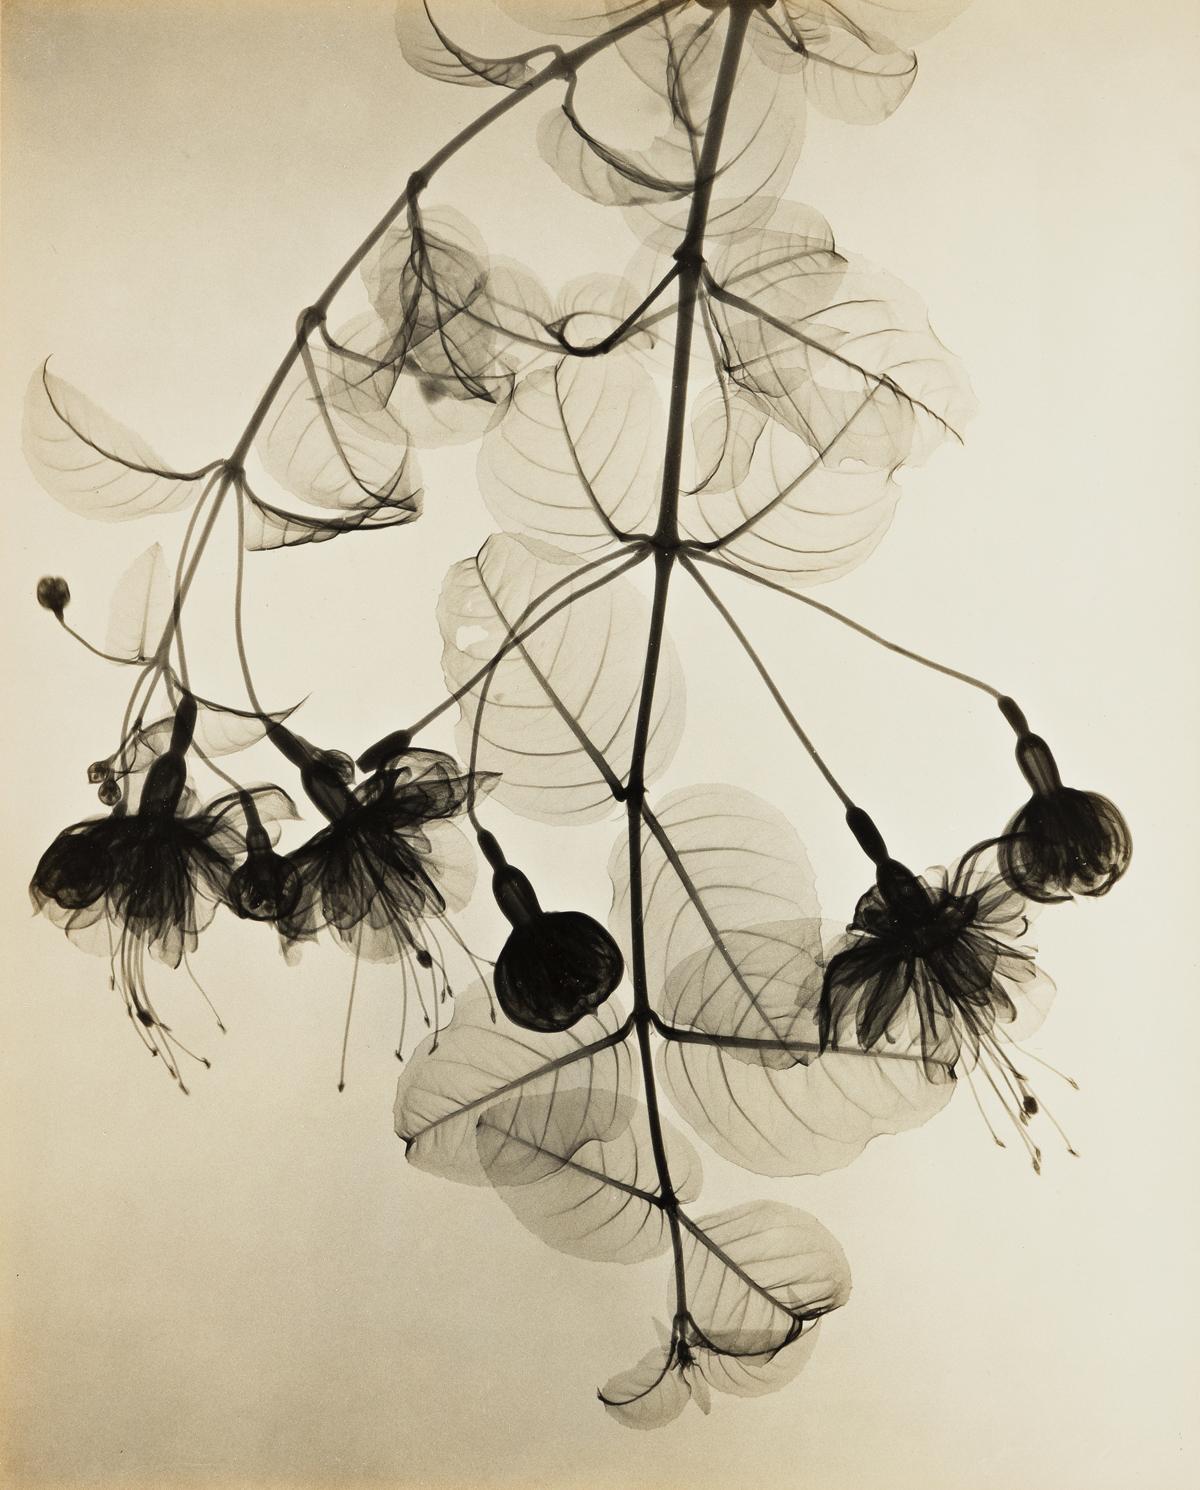 DAIN L. TASKER (1872-1962) X-Ray of Hanging Fuchsia.